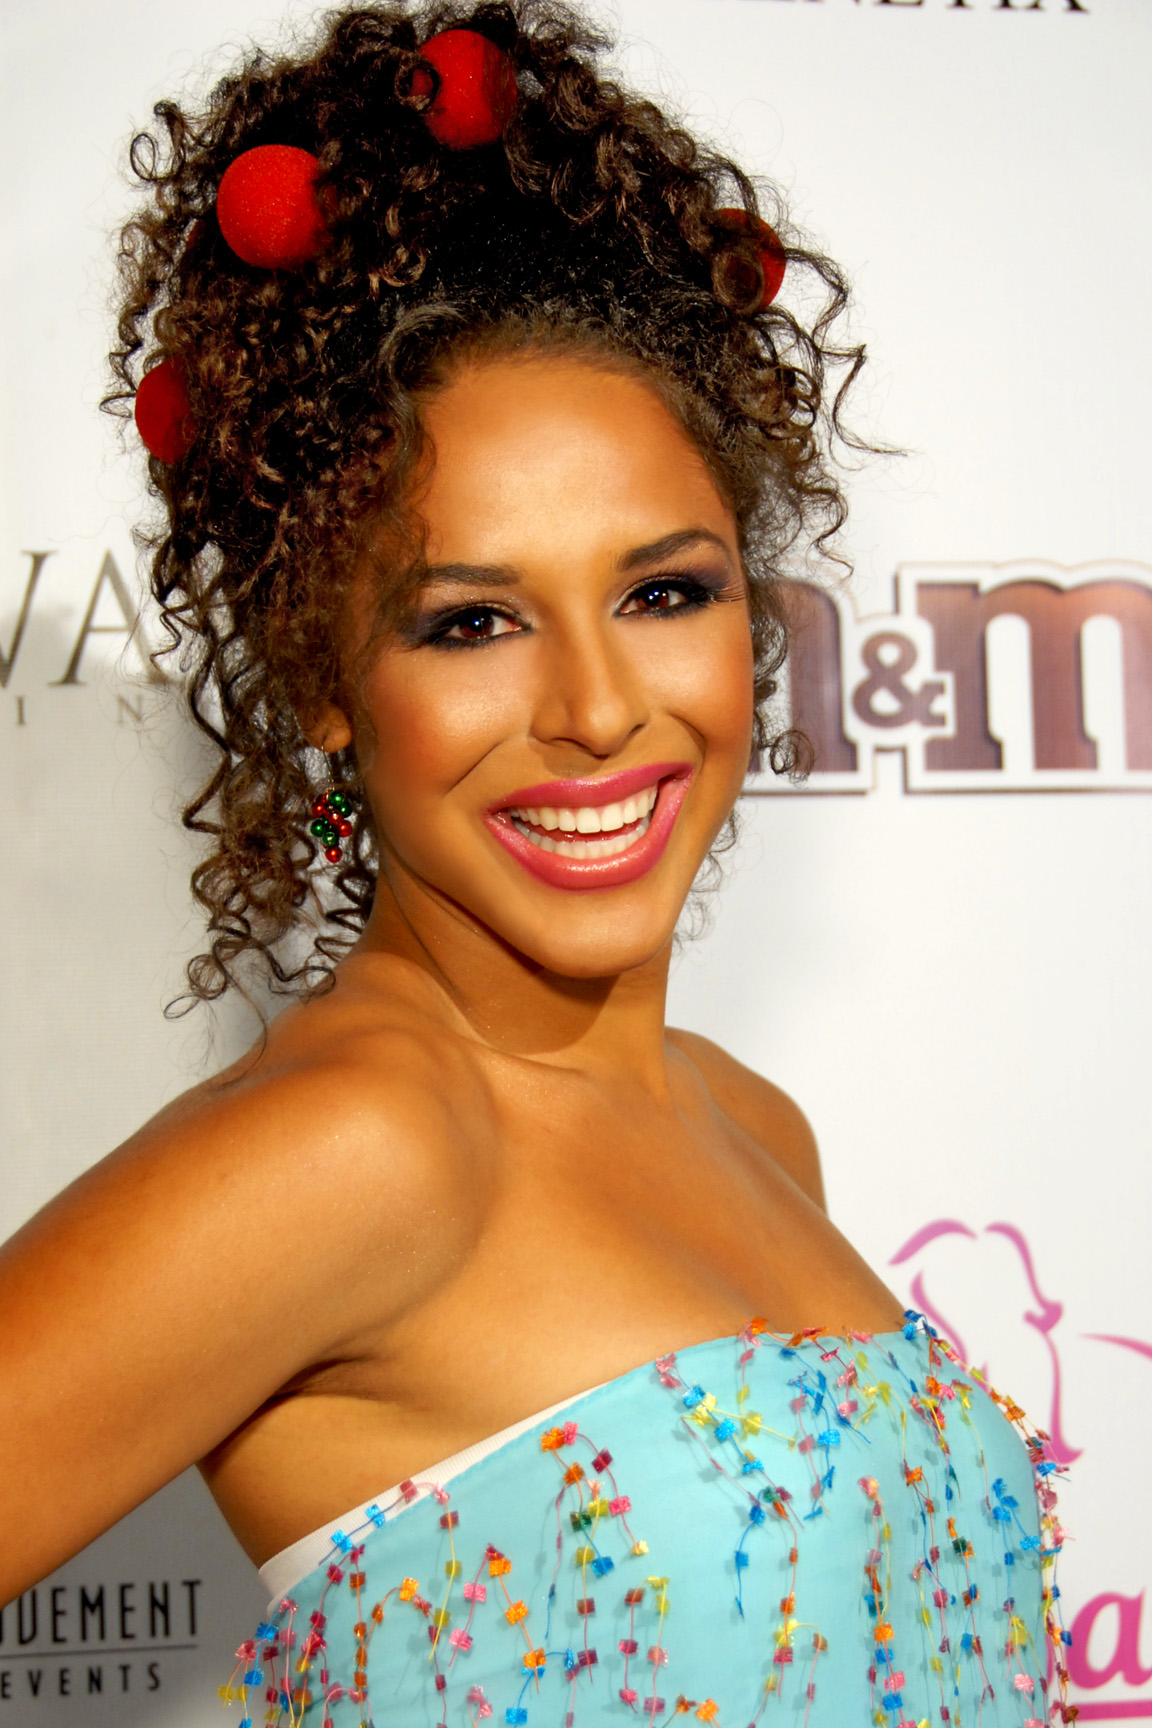 Brittany Bell, Miss Arizona USA 2010